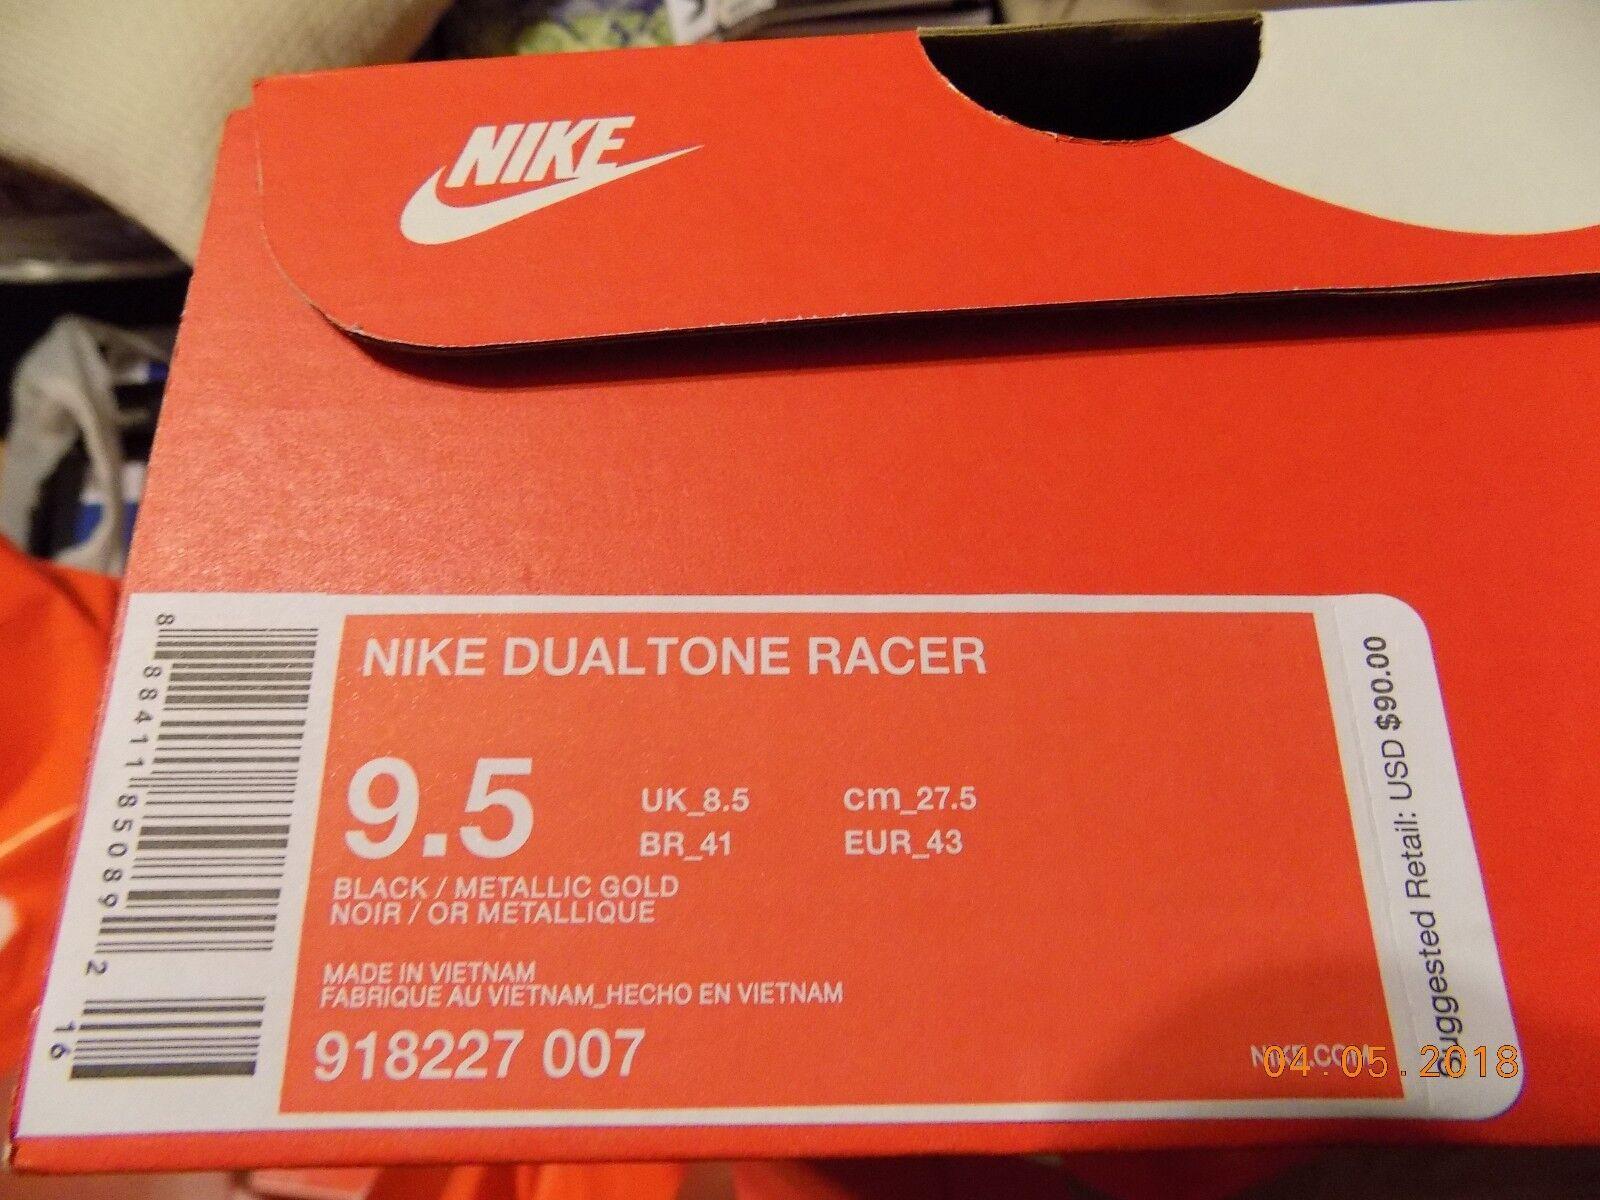 Nike dualtone dualtone dualtone racer schwarz / gold - männer mit box!!!!!!!! 9311c0